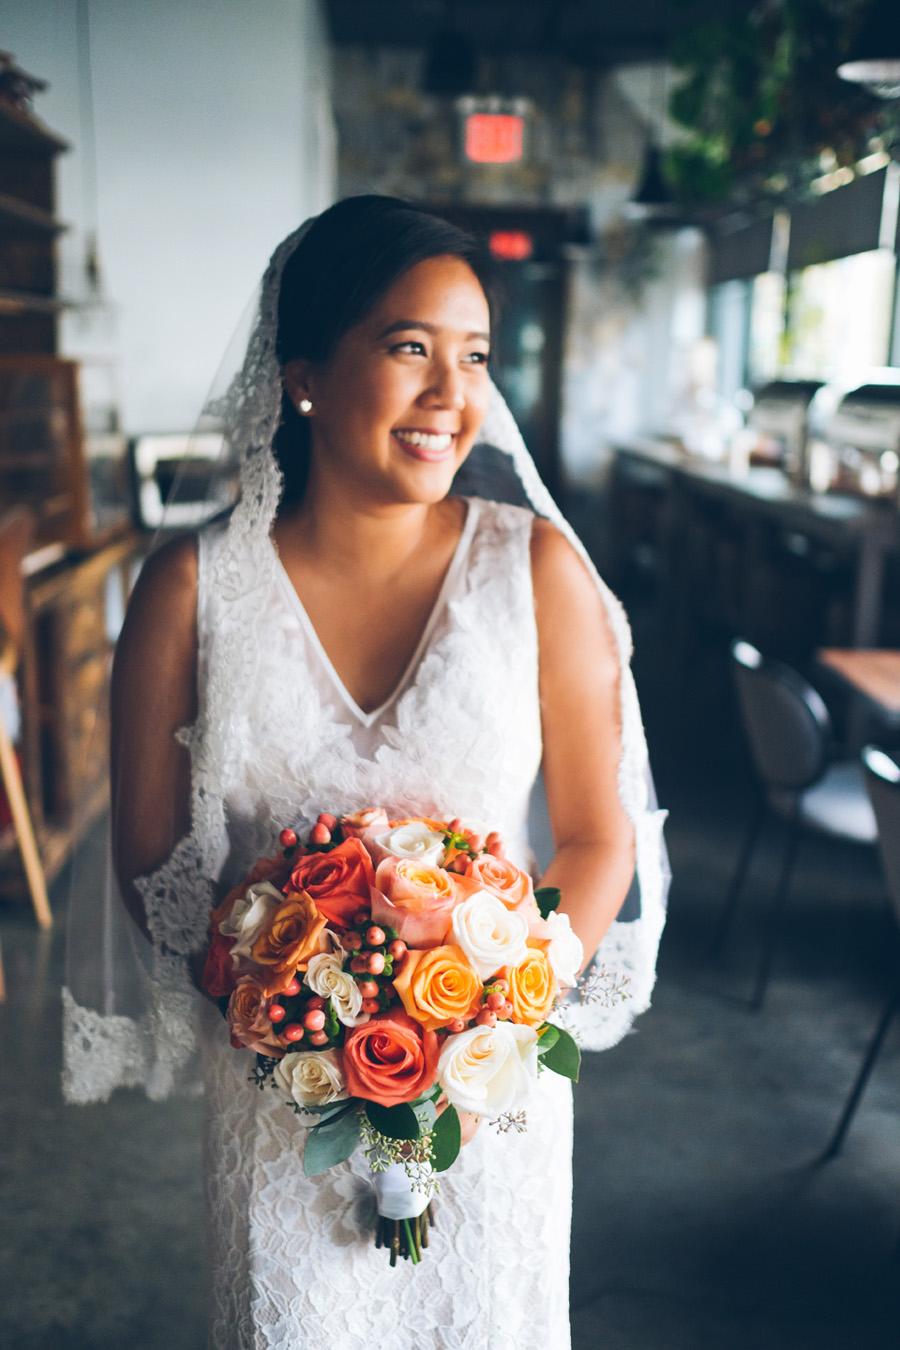 POOH-PETER-NYC-WEDDING-BRIDEGROOM-CYNTHIACHUNG-0079.jpg